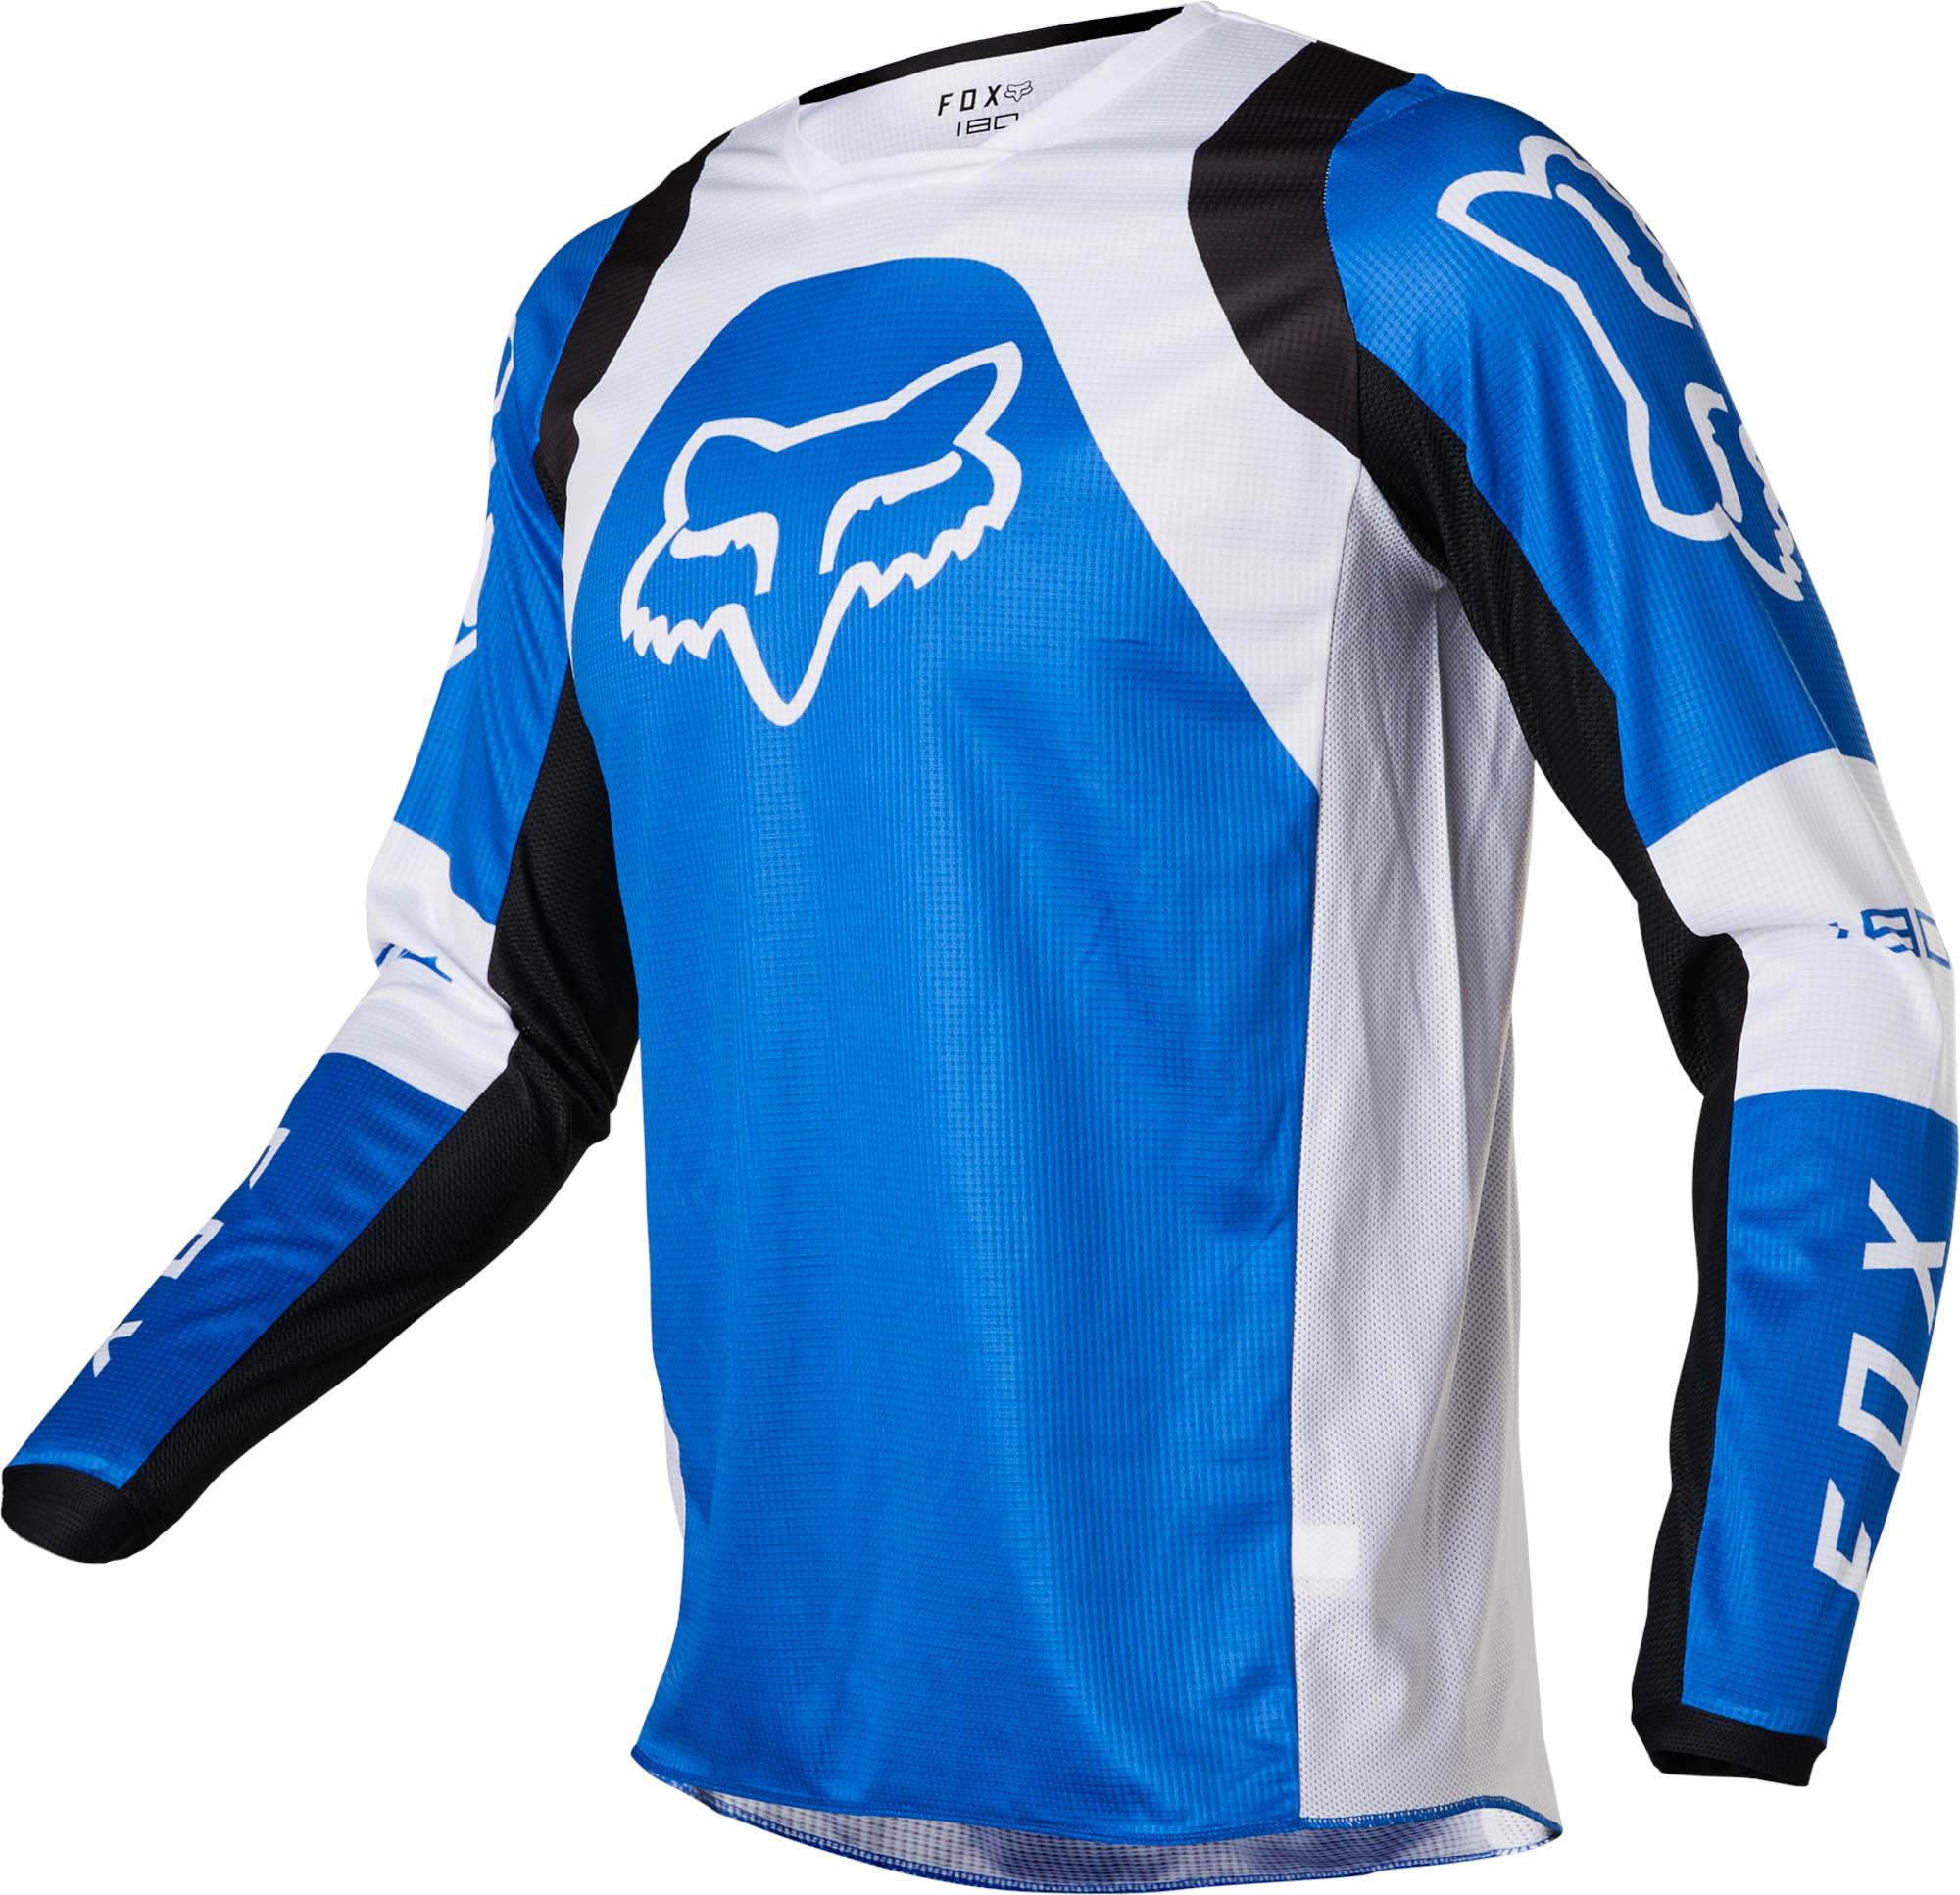 FOX 180 Lux Jersey - Blue MX22